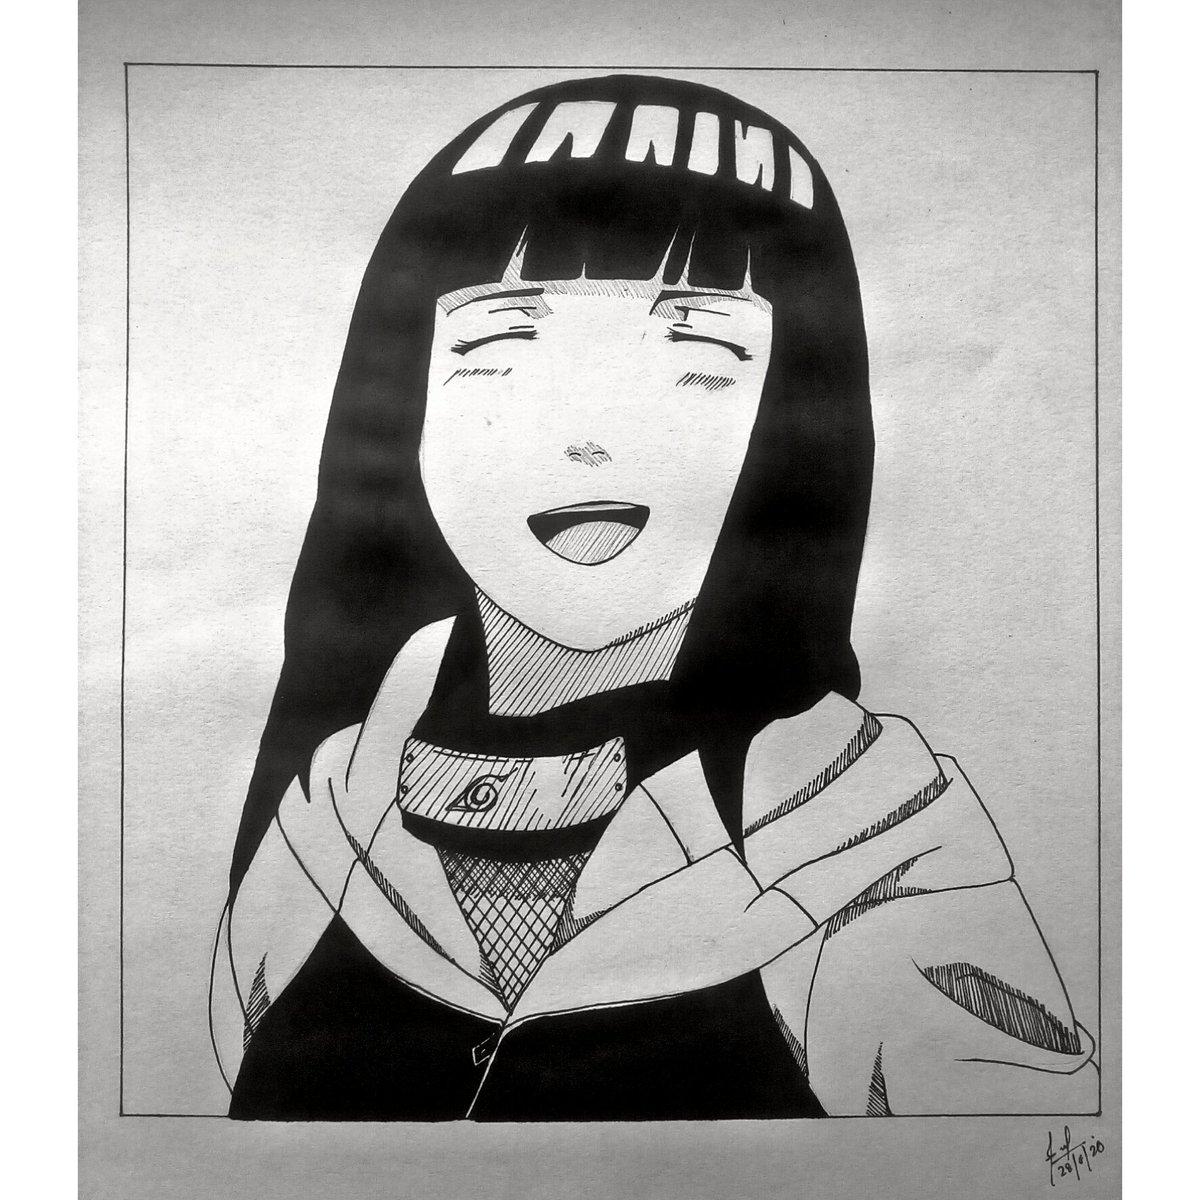 Hinata from Naruto  . . . . .#traditionalart #traditionalartwork #kristotheartcollector #animeartwork #animeart_worldwide #animeartshelp #mangaartist #animearttr #animedrawing #drawinganime #fantasy #animeartgallery #animeartassistant #animefreak #illustration #artistsoninstagrampic.twitter.com/9XQmSW24oU